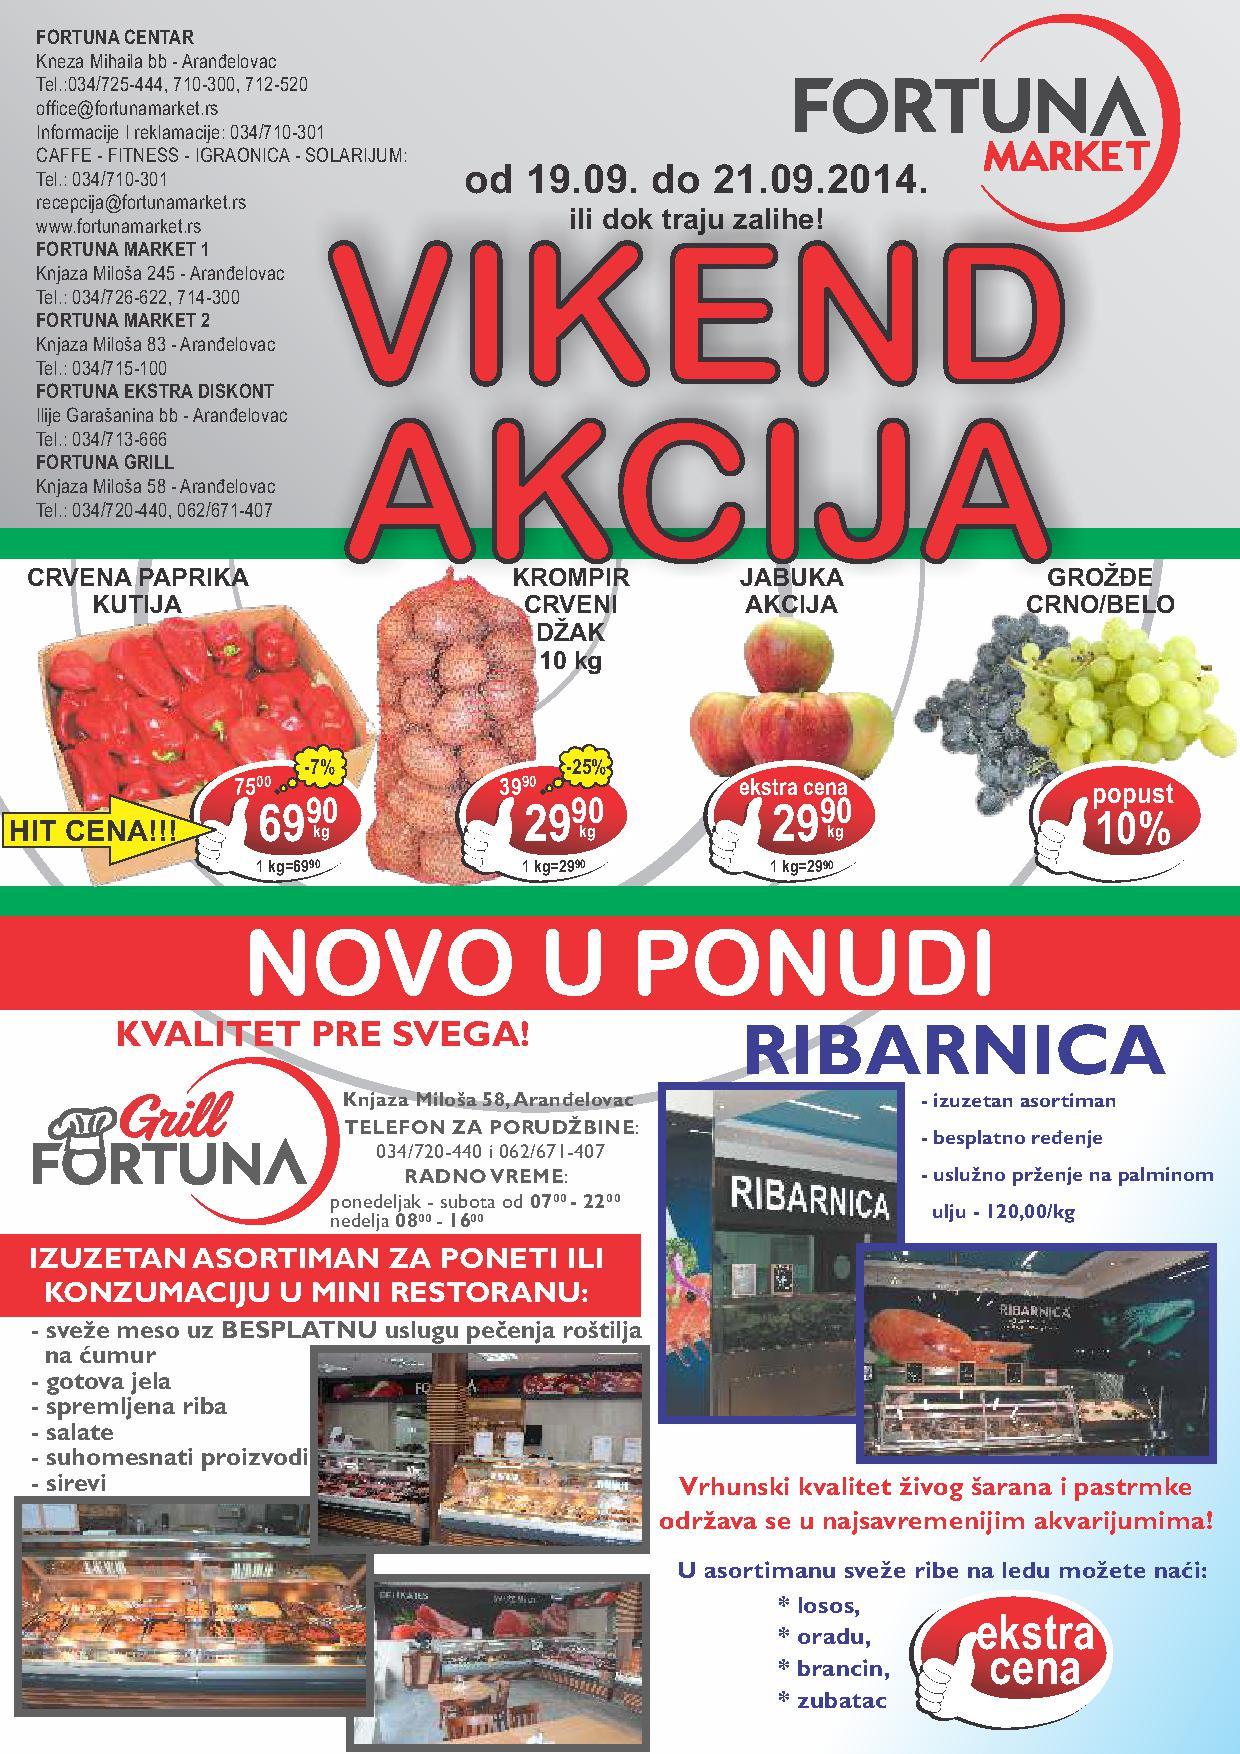 Fortuna market akcija vikend popusta